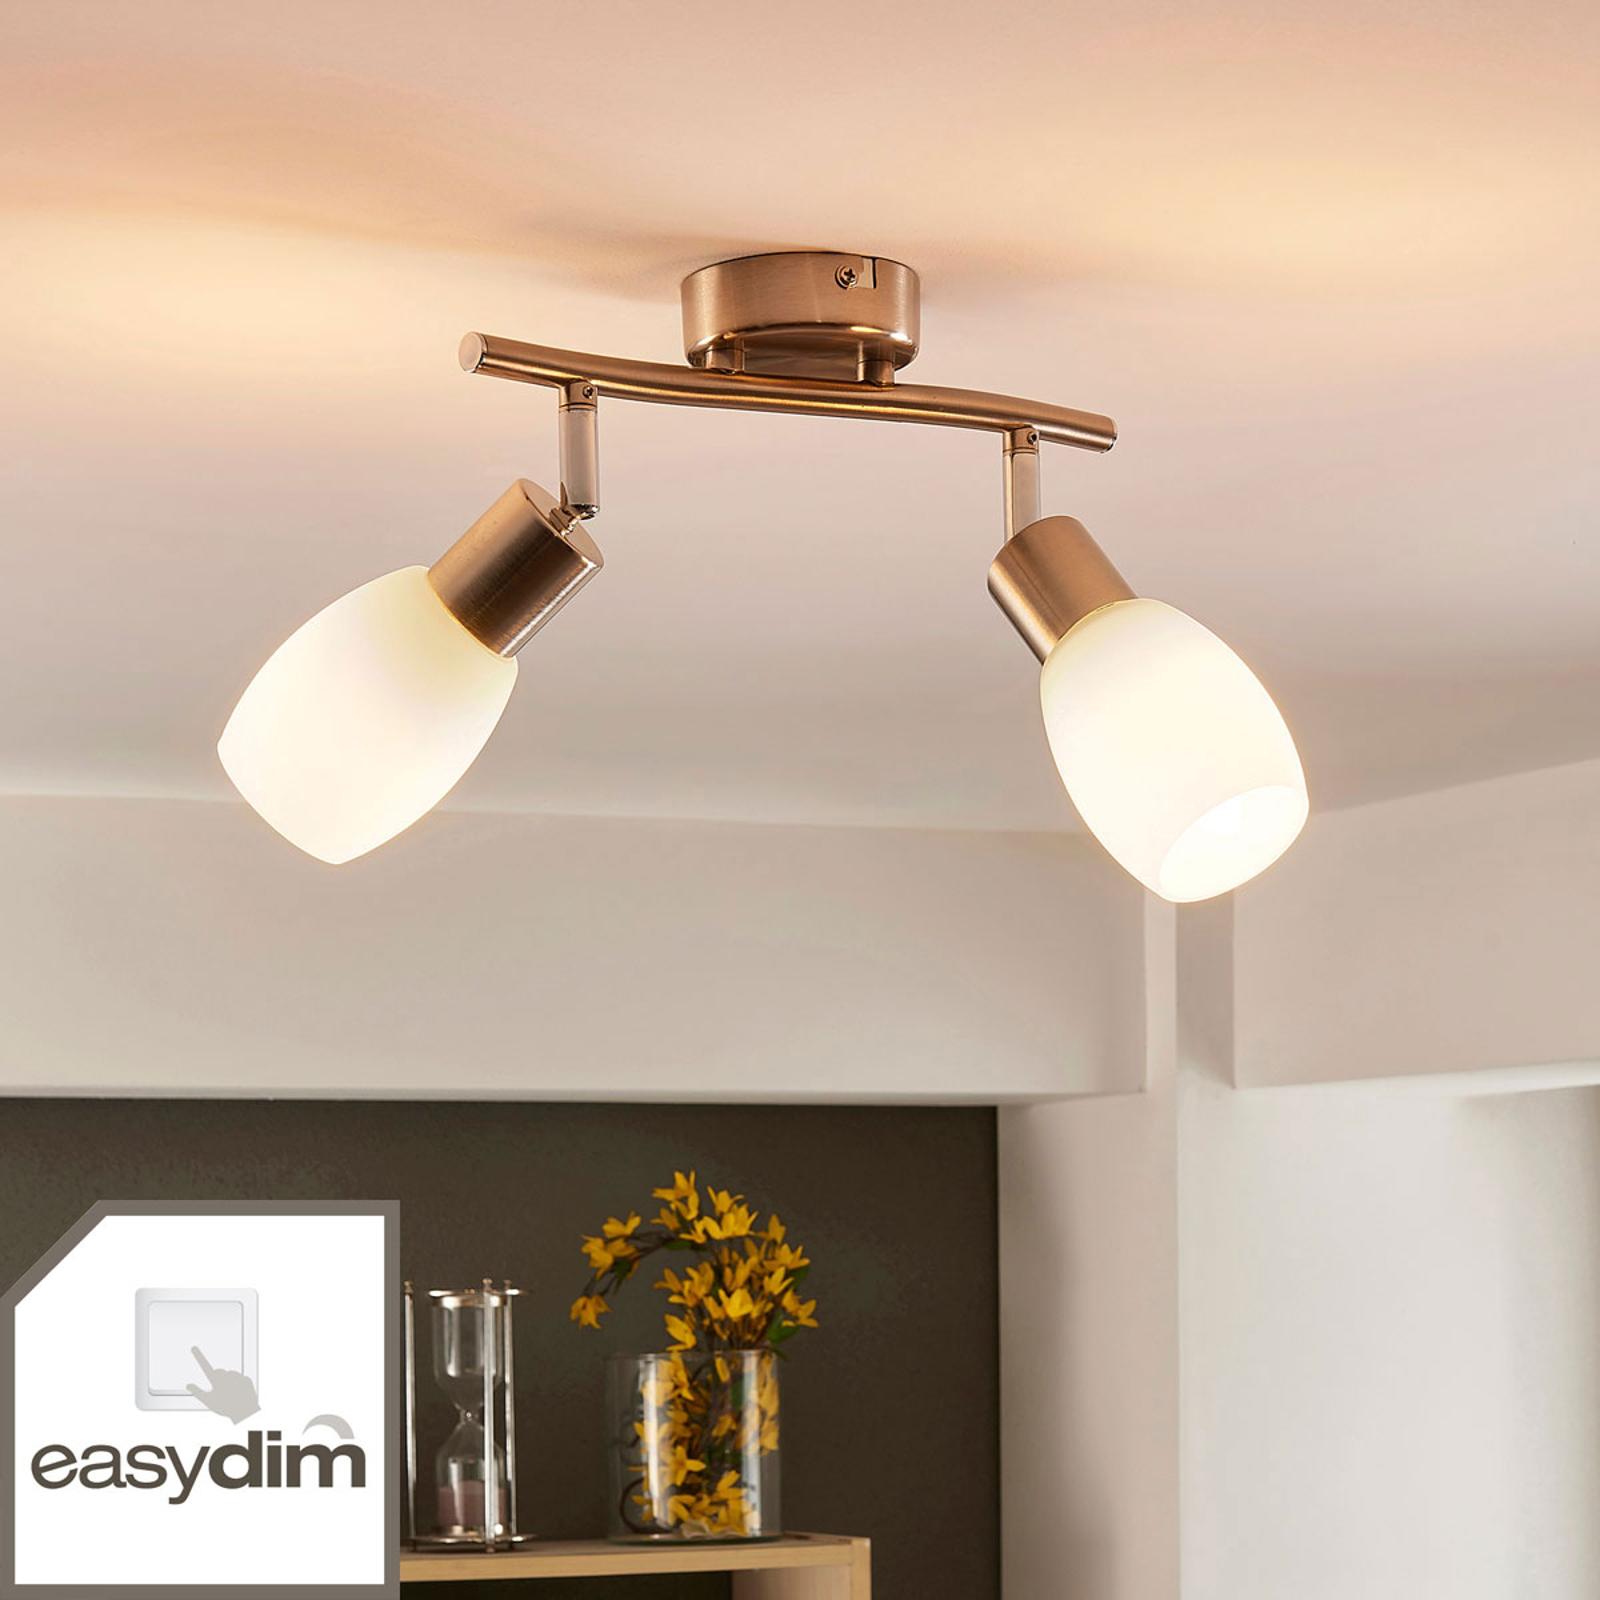 Arda - LED spot voor muur en plafond, easydim